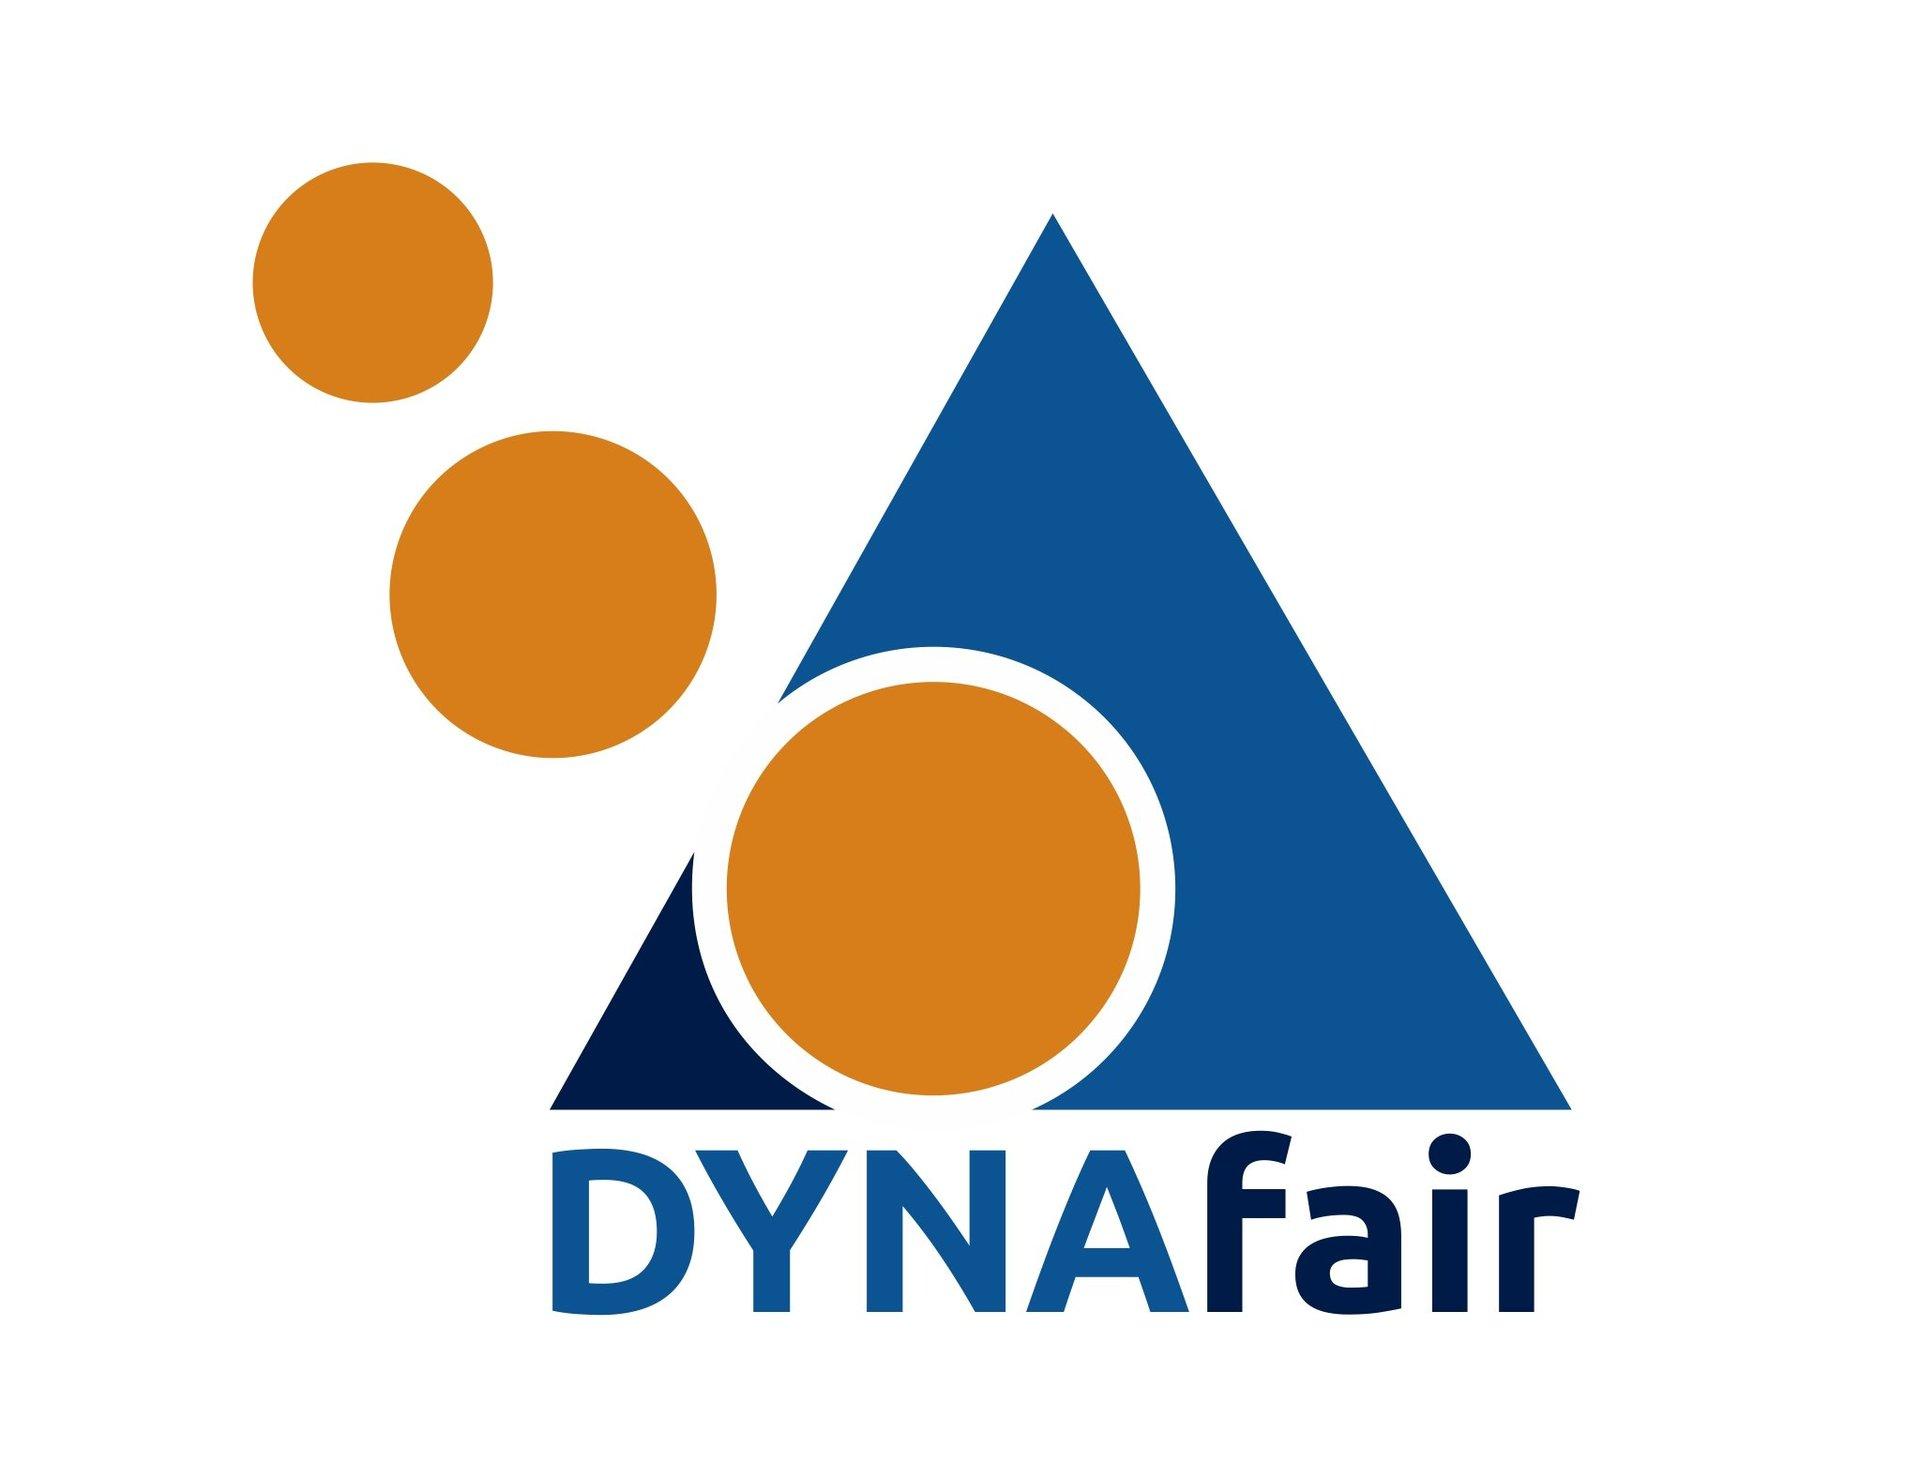 DYNAFair